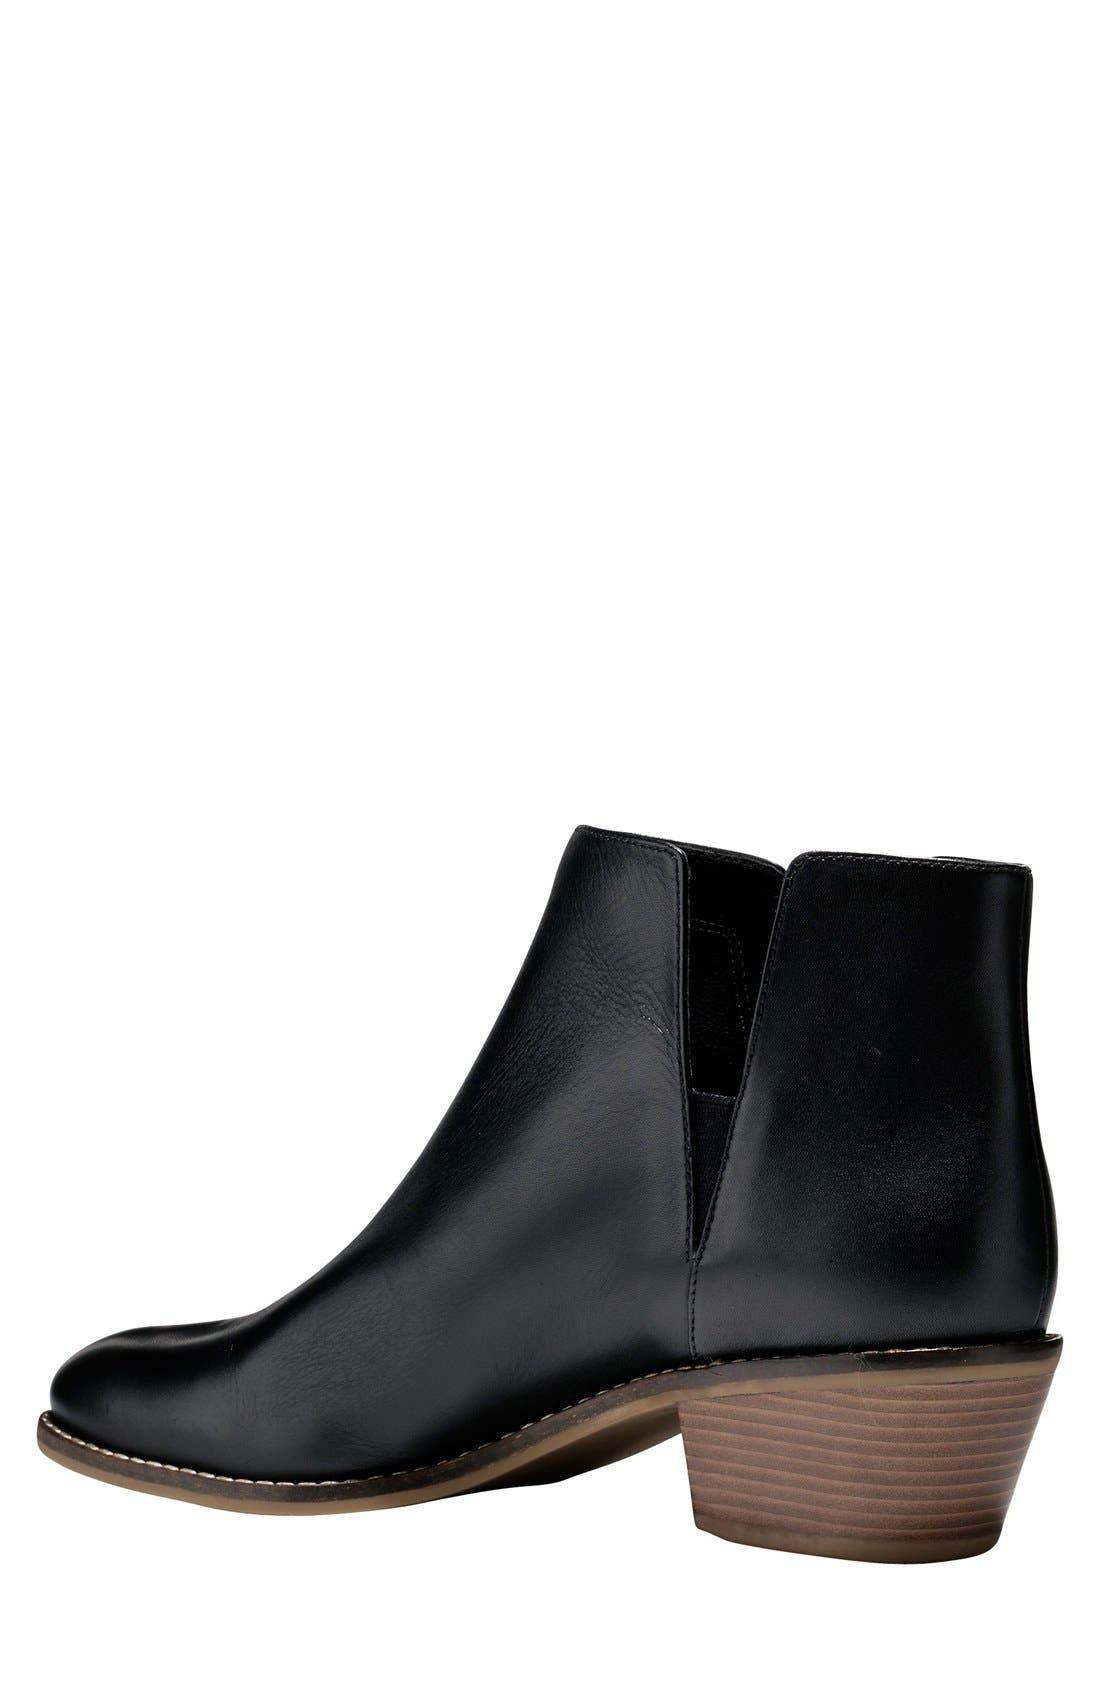 Alternate Image 3  - Cole Haan 'Abbot' Chelsea Boot (Women)